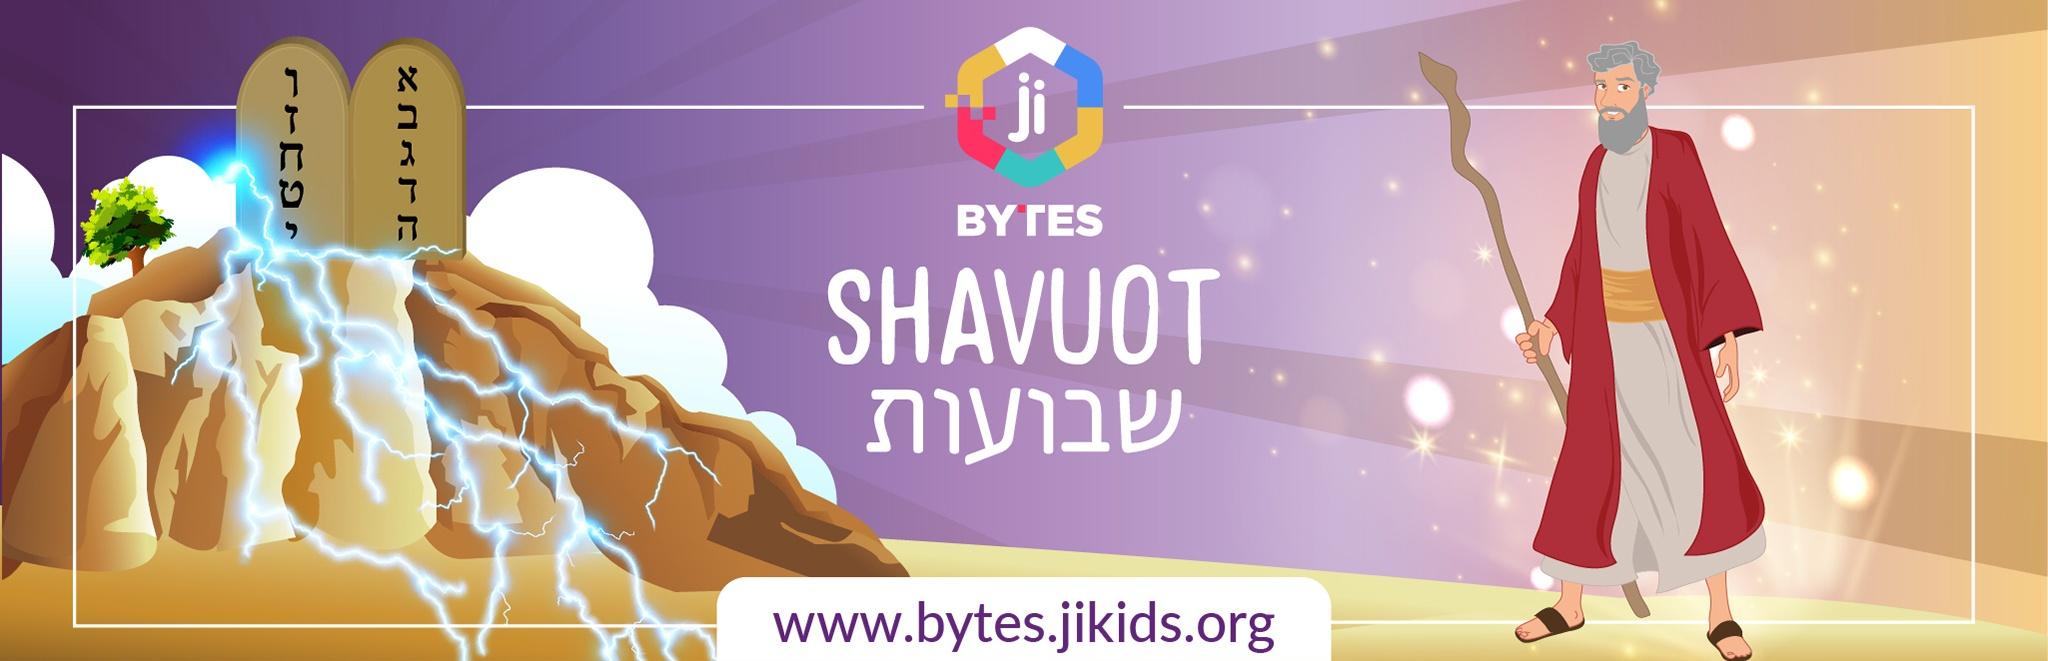 Shavuot Bytes